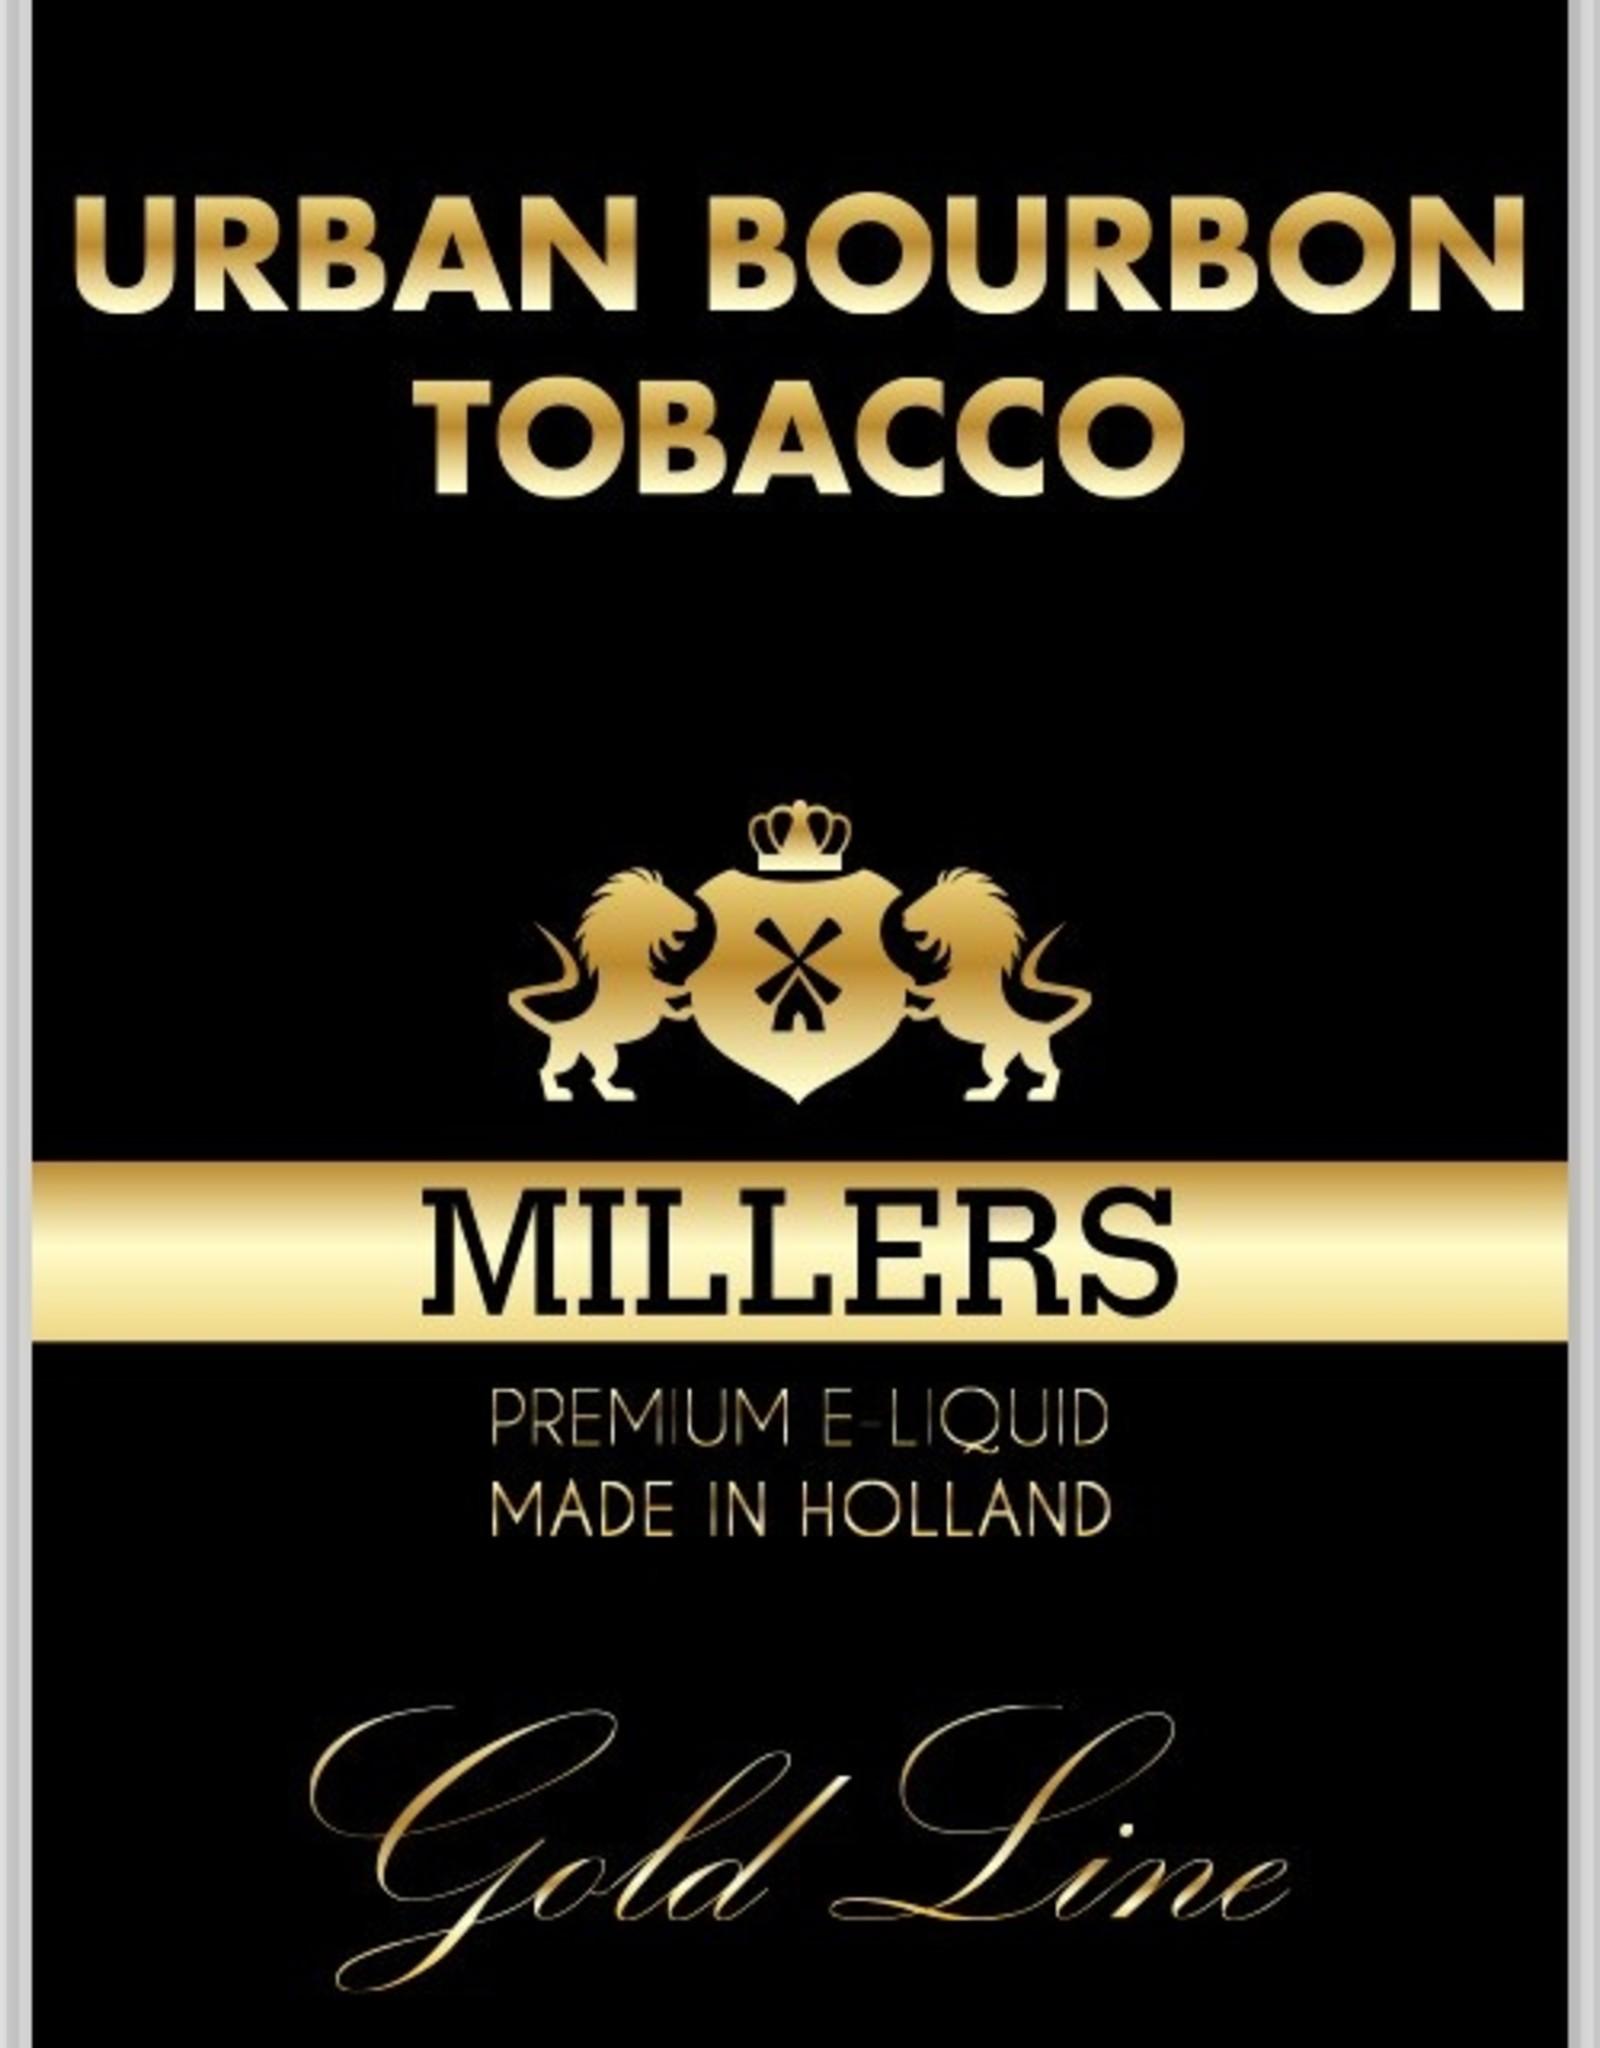 Millers Juice Miller Juice E-liquid Goldline 10 ml Urban Bourbon Tobacco 6 mg